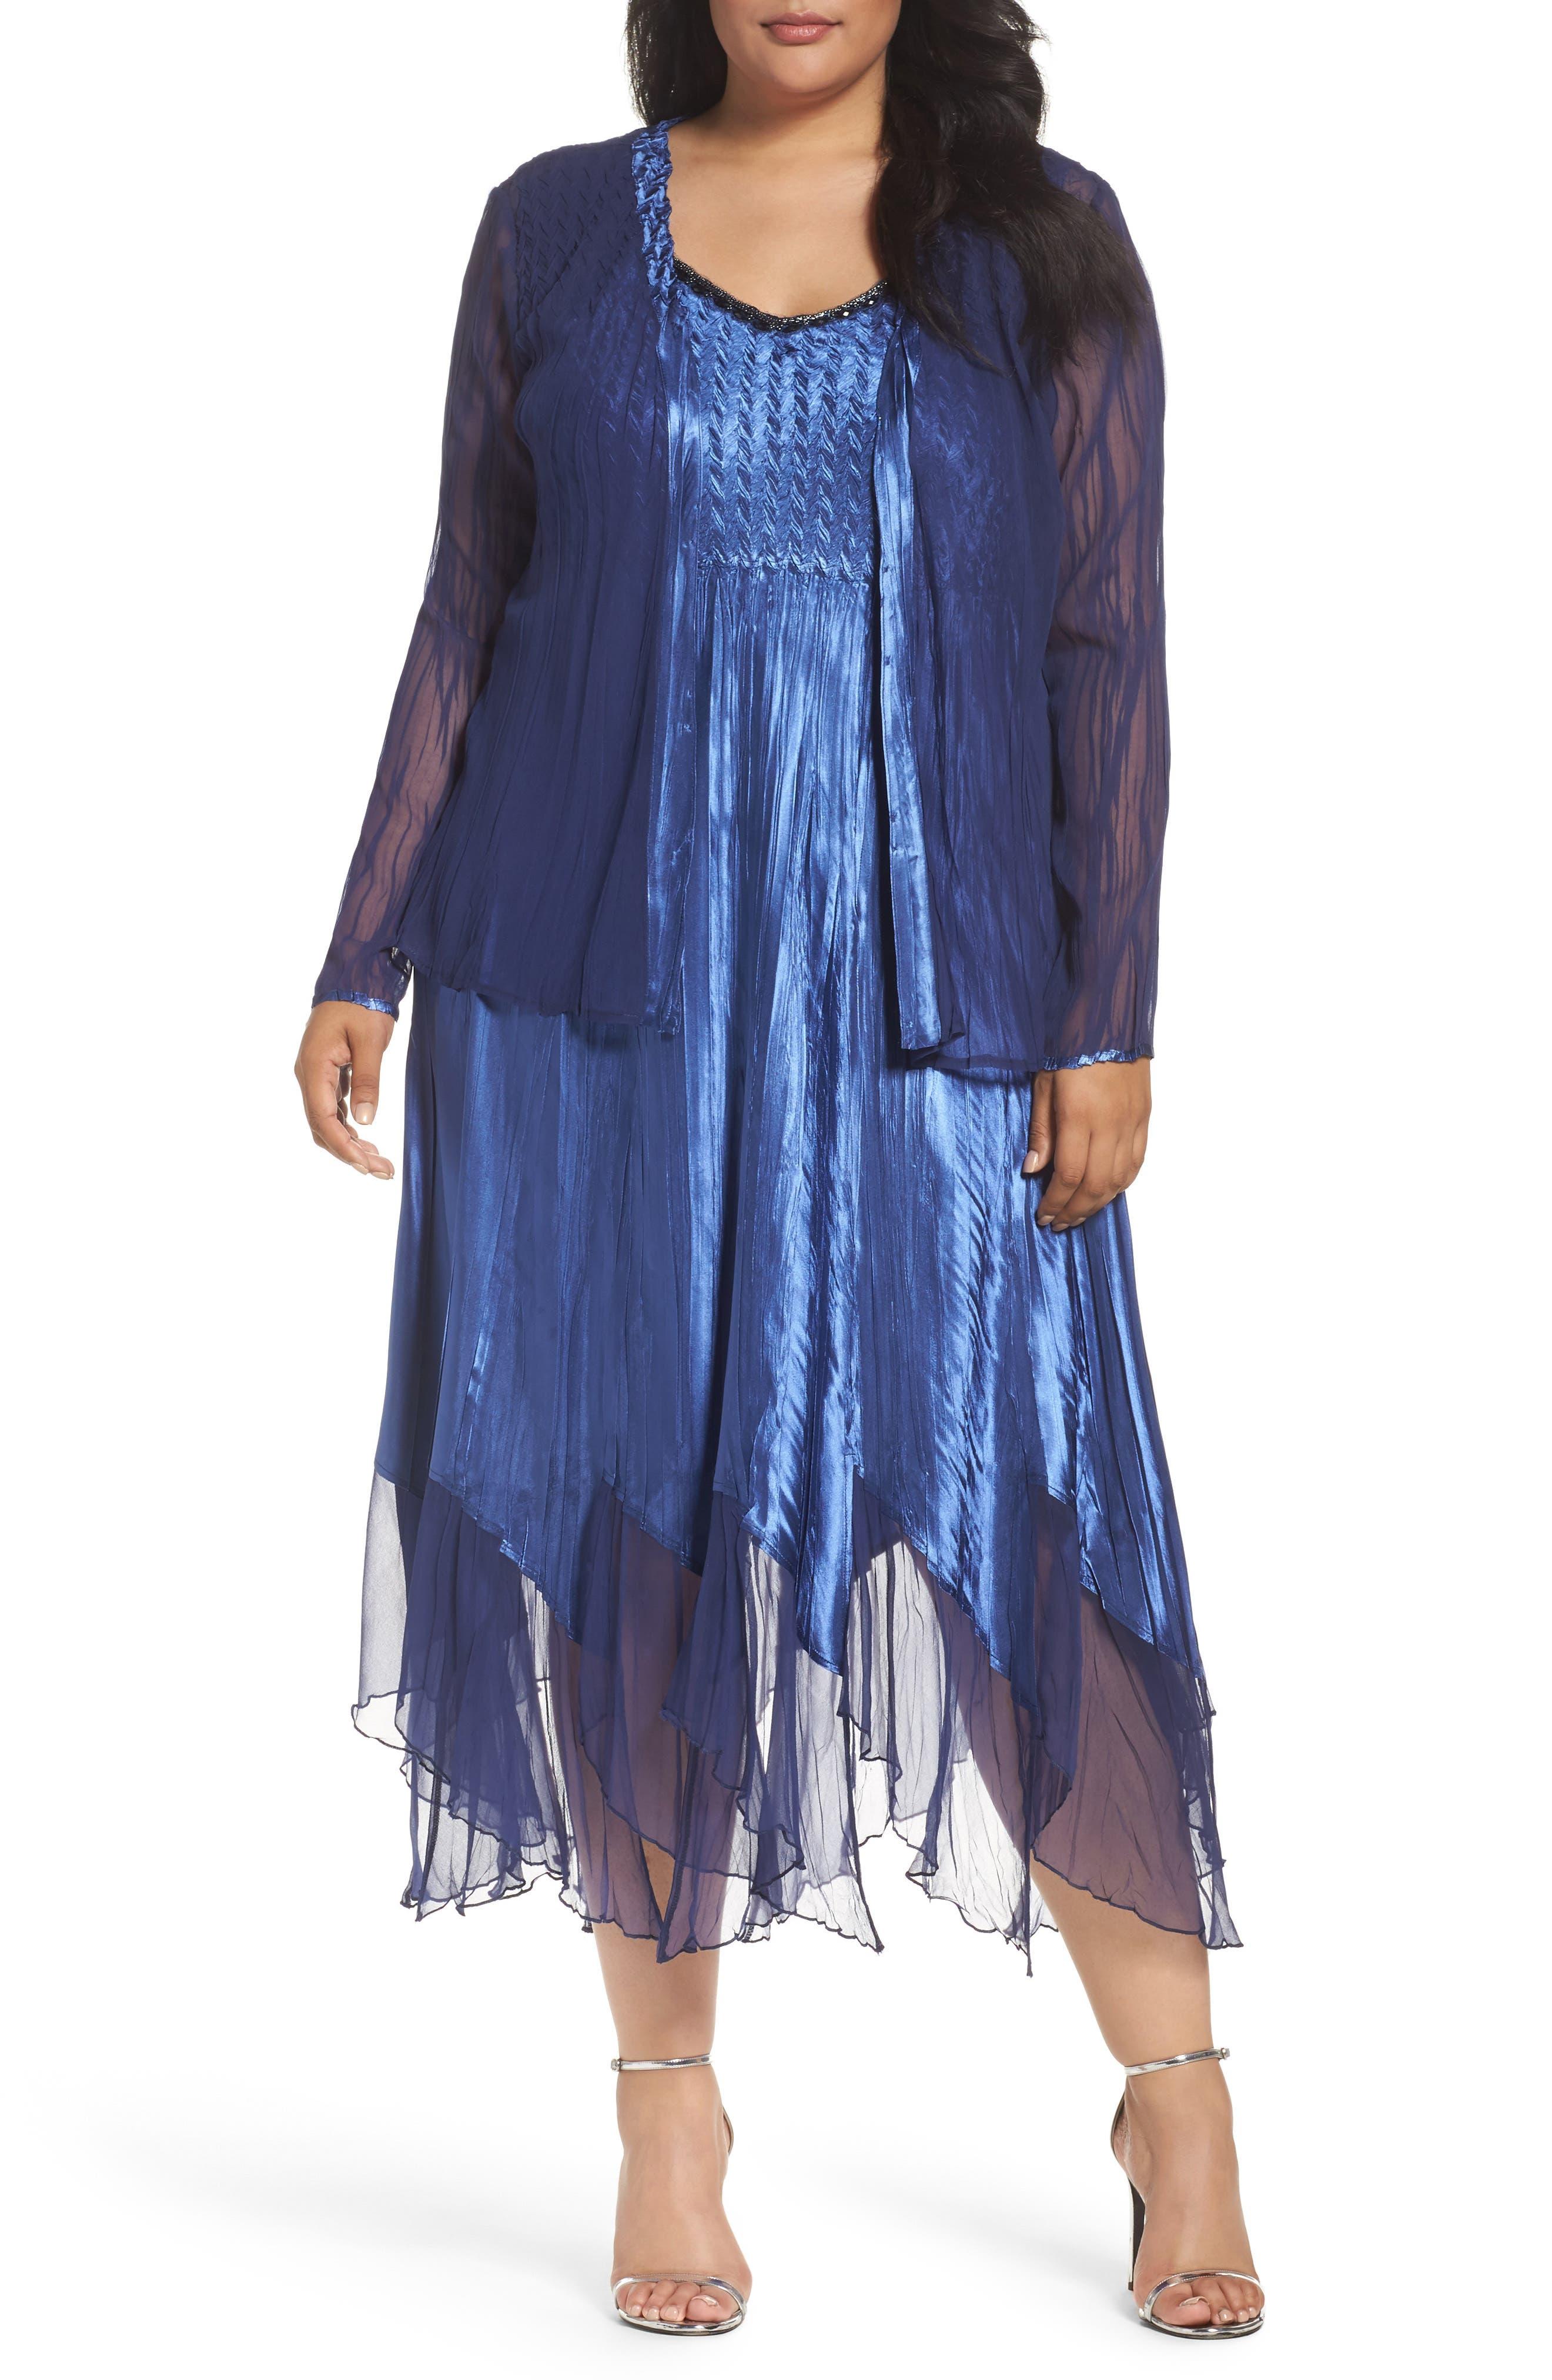 Main Image - Komarov Embellished A-Line Dress and Jacket (Plus Size)